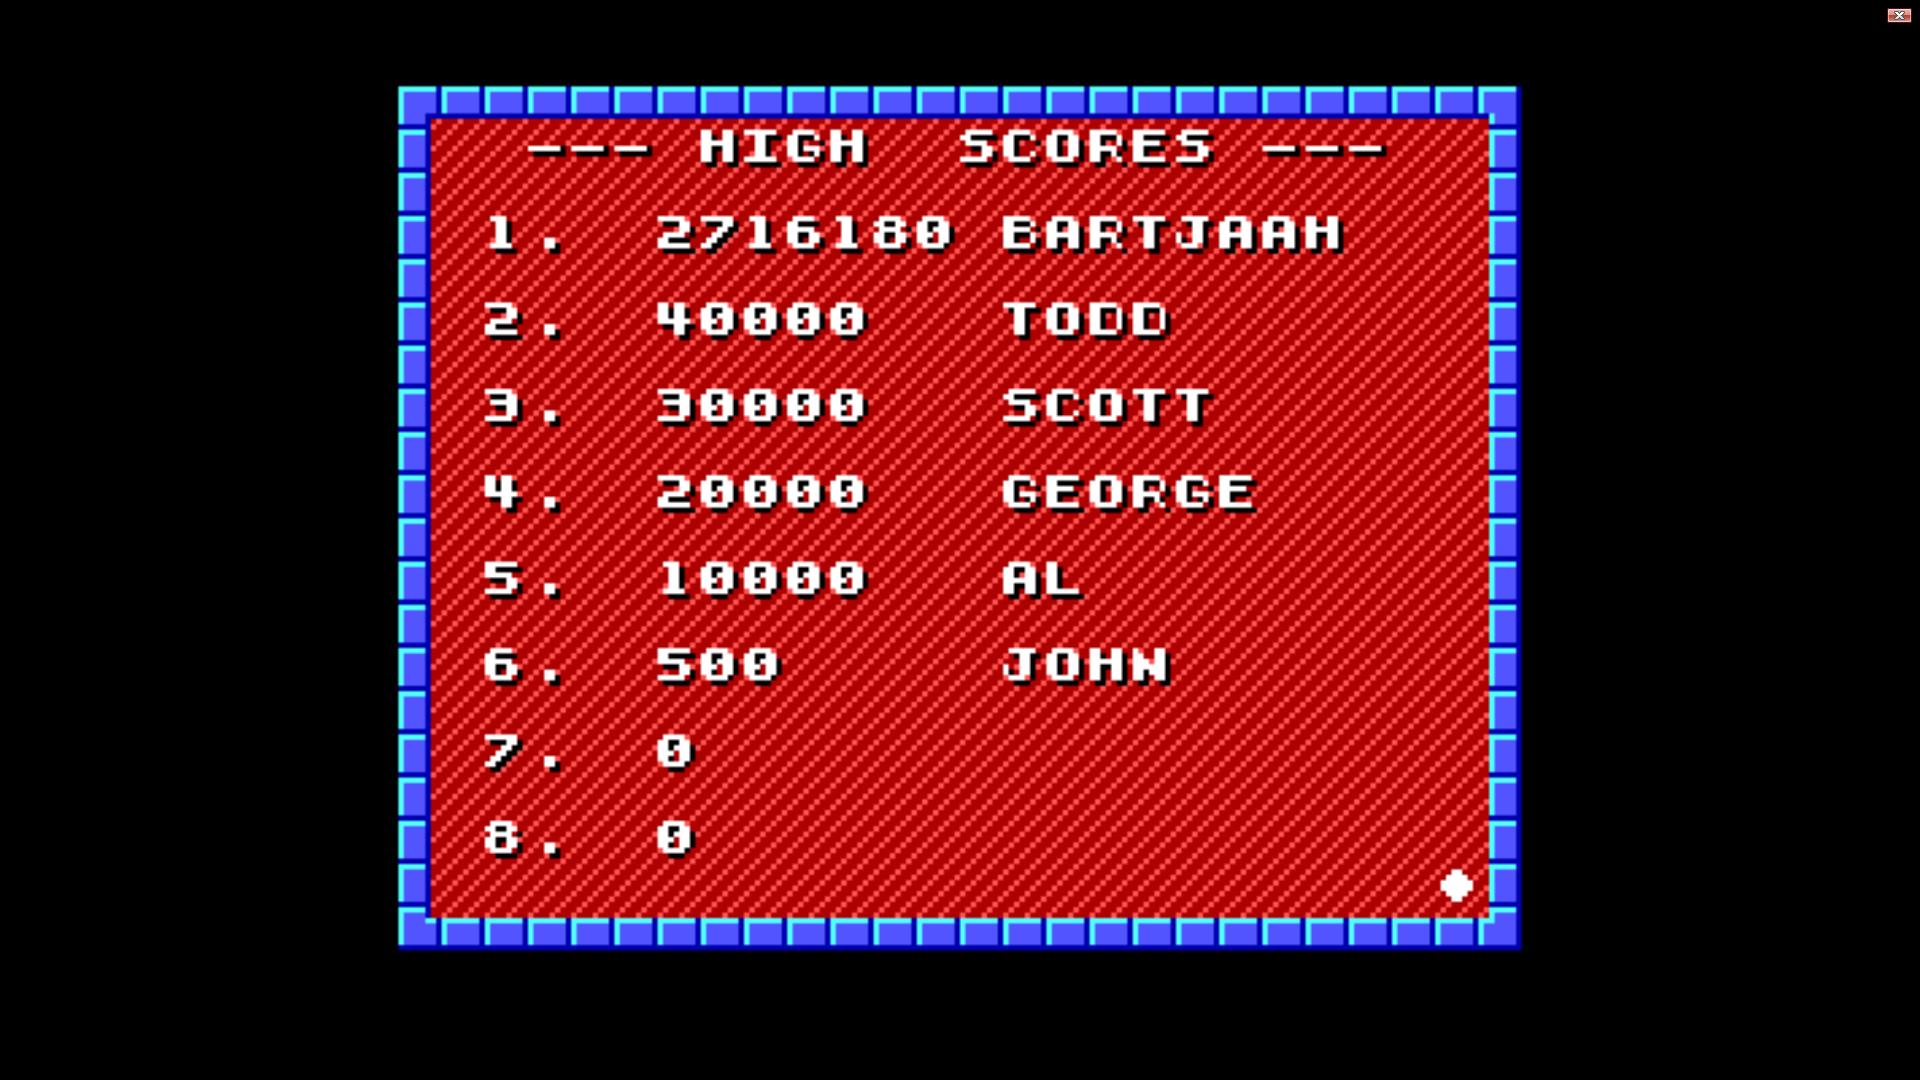 Bartjaah: Duke Nukem: Episode 2: Mission Moonbase (PC Emulated / DOSBox) 2,716,180 points on 2014-11-25 14:45:04